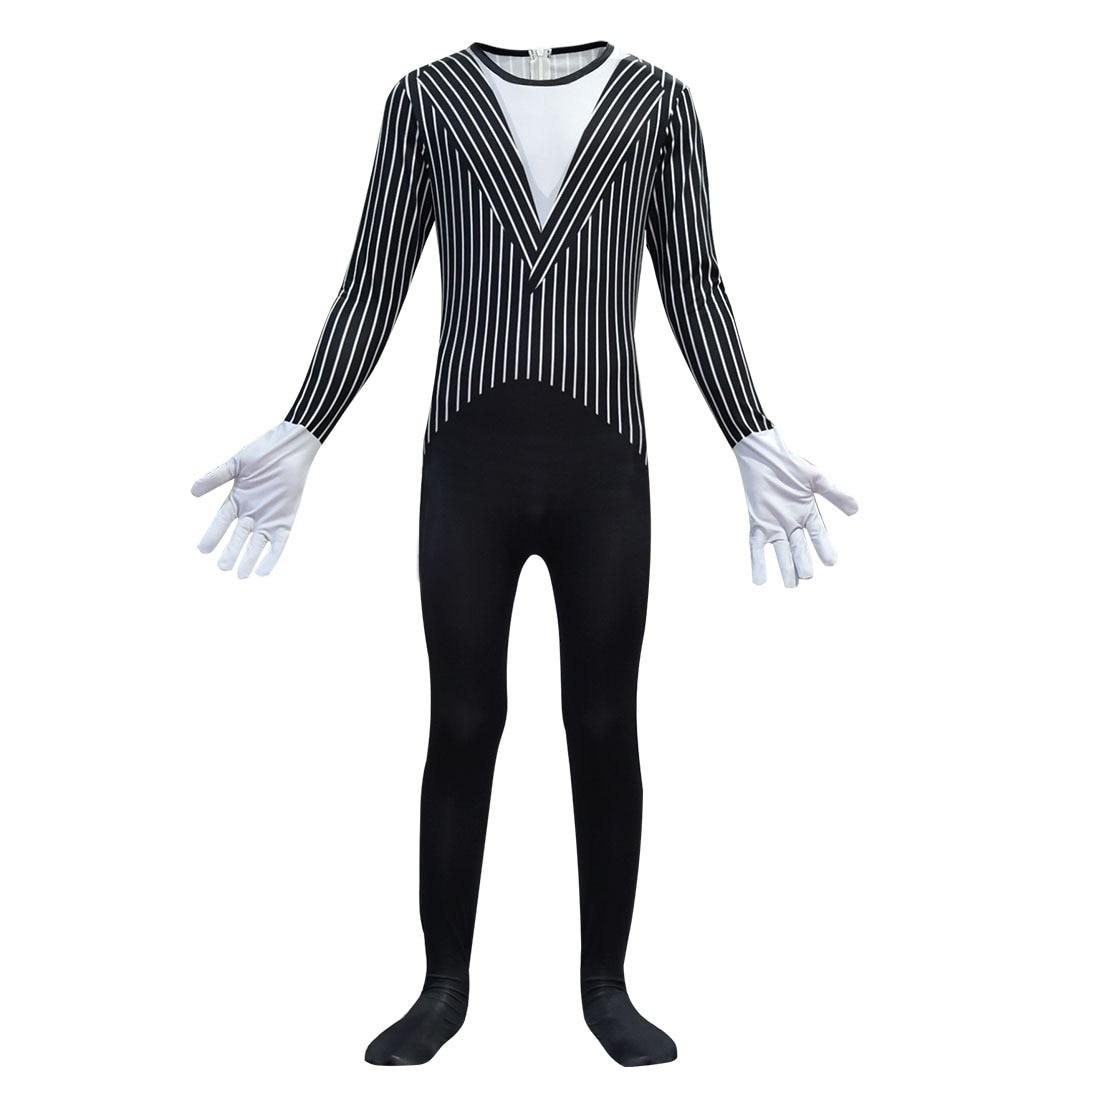 Anime Jack Skellington Kids Cosplay Costume Christmas Carnival Fancy Black Stripe Jumpsuit+Mask Children Boys Clothes C46599CH 3